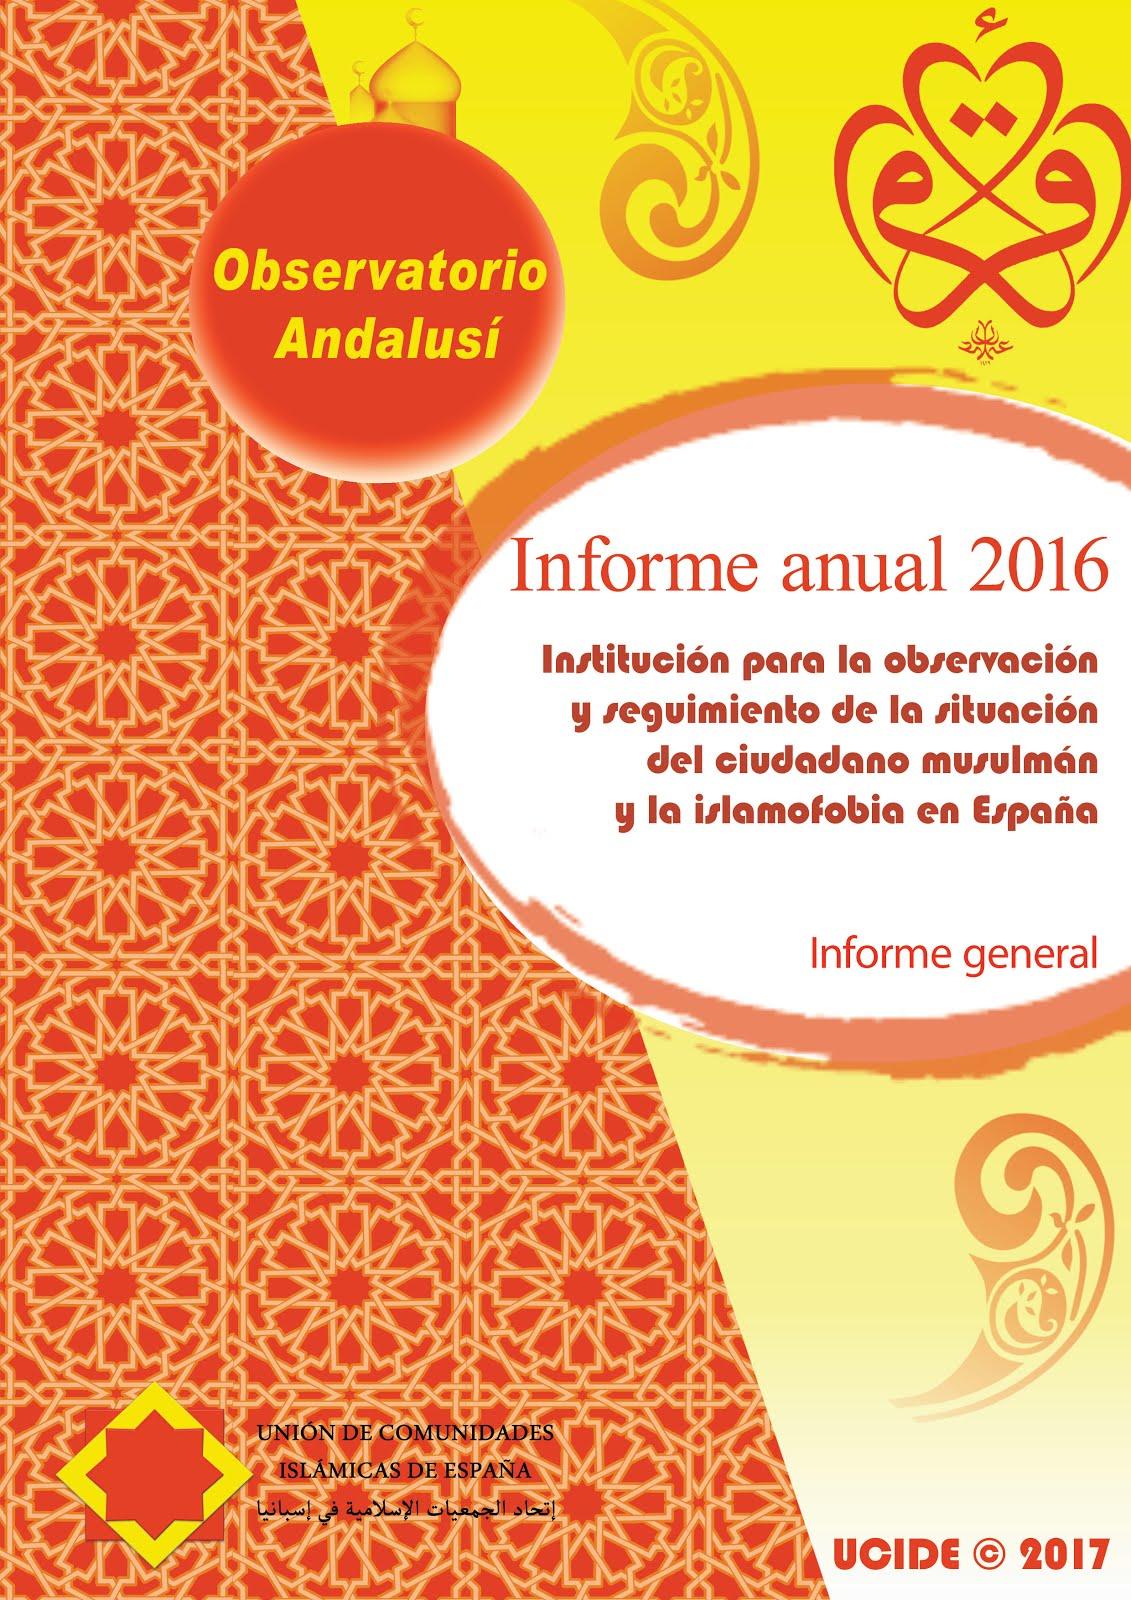 Informe anual de 2016